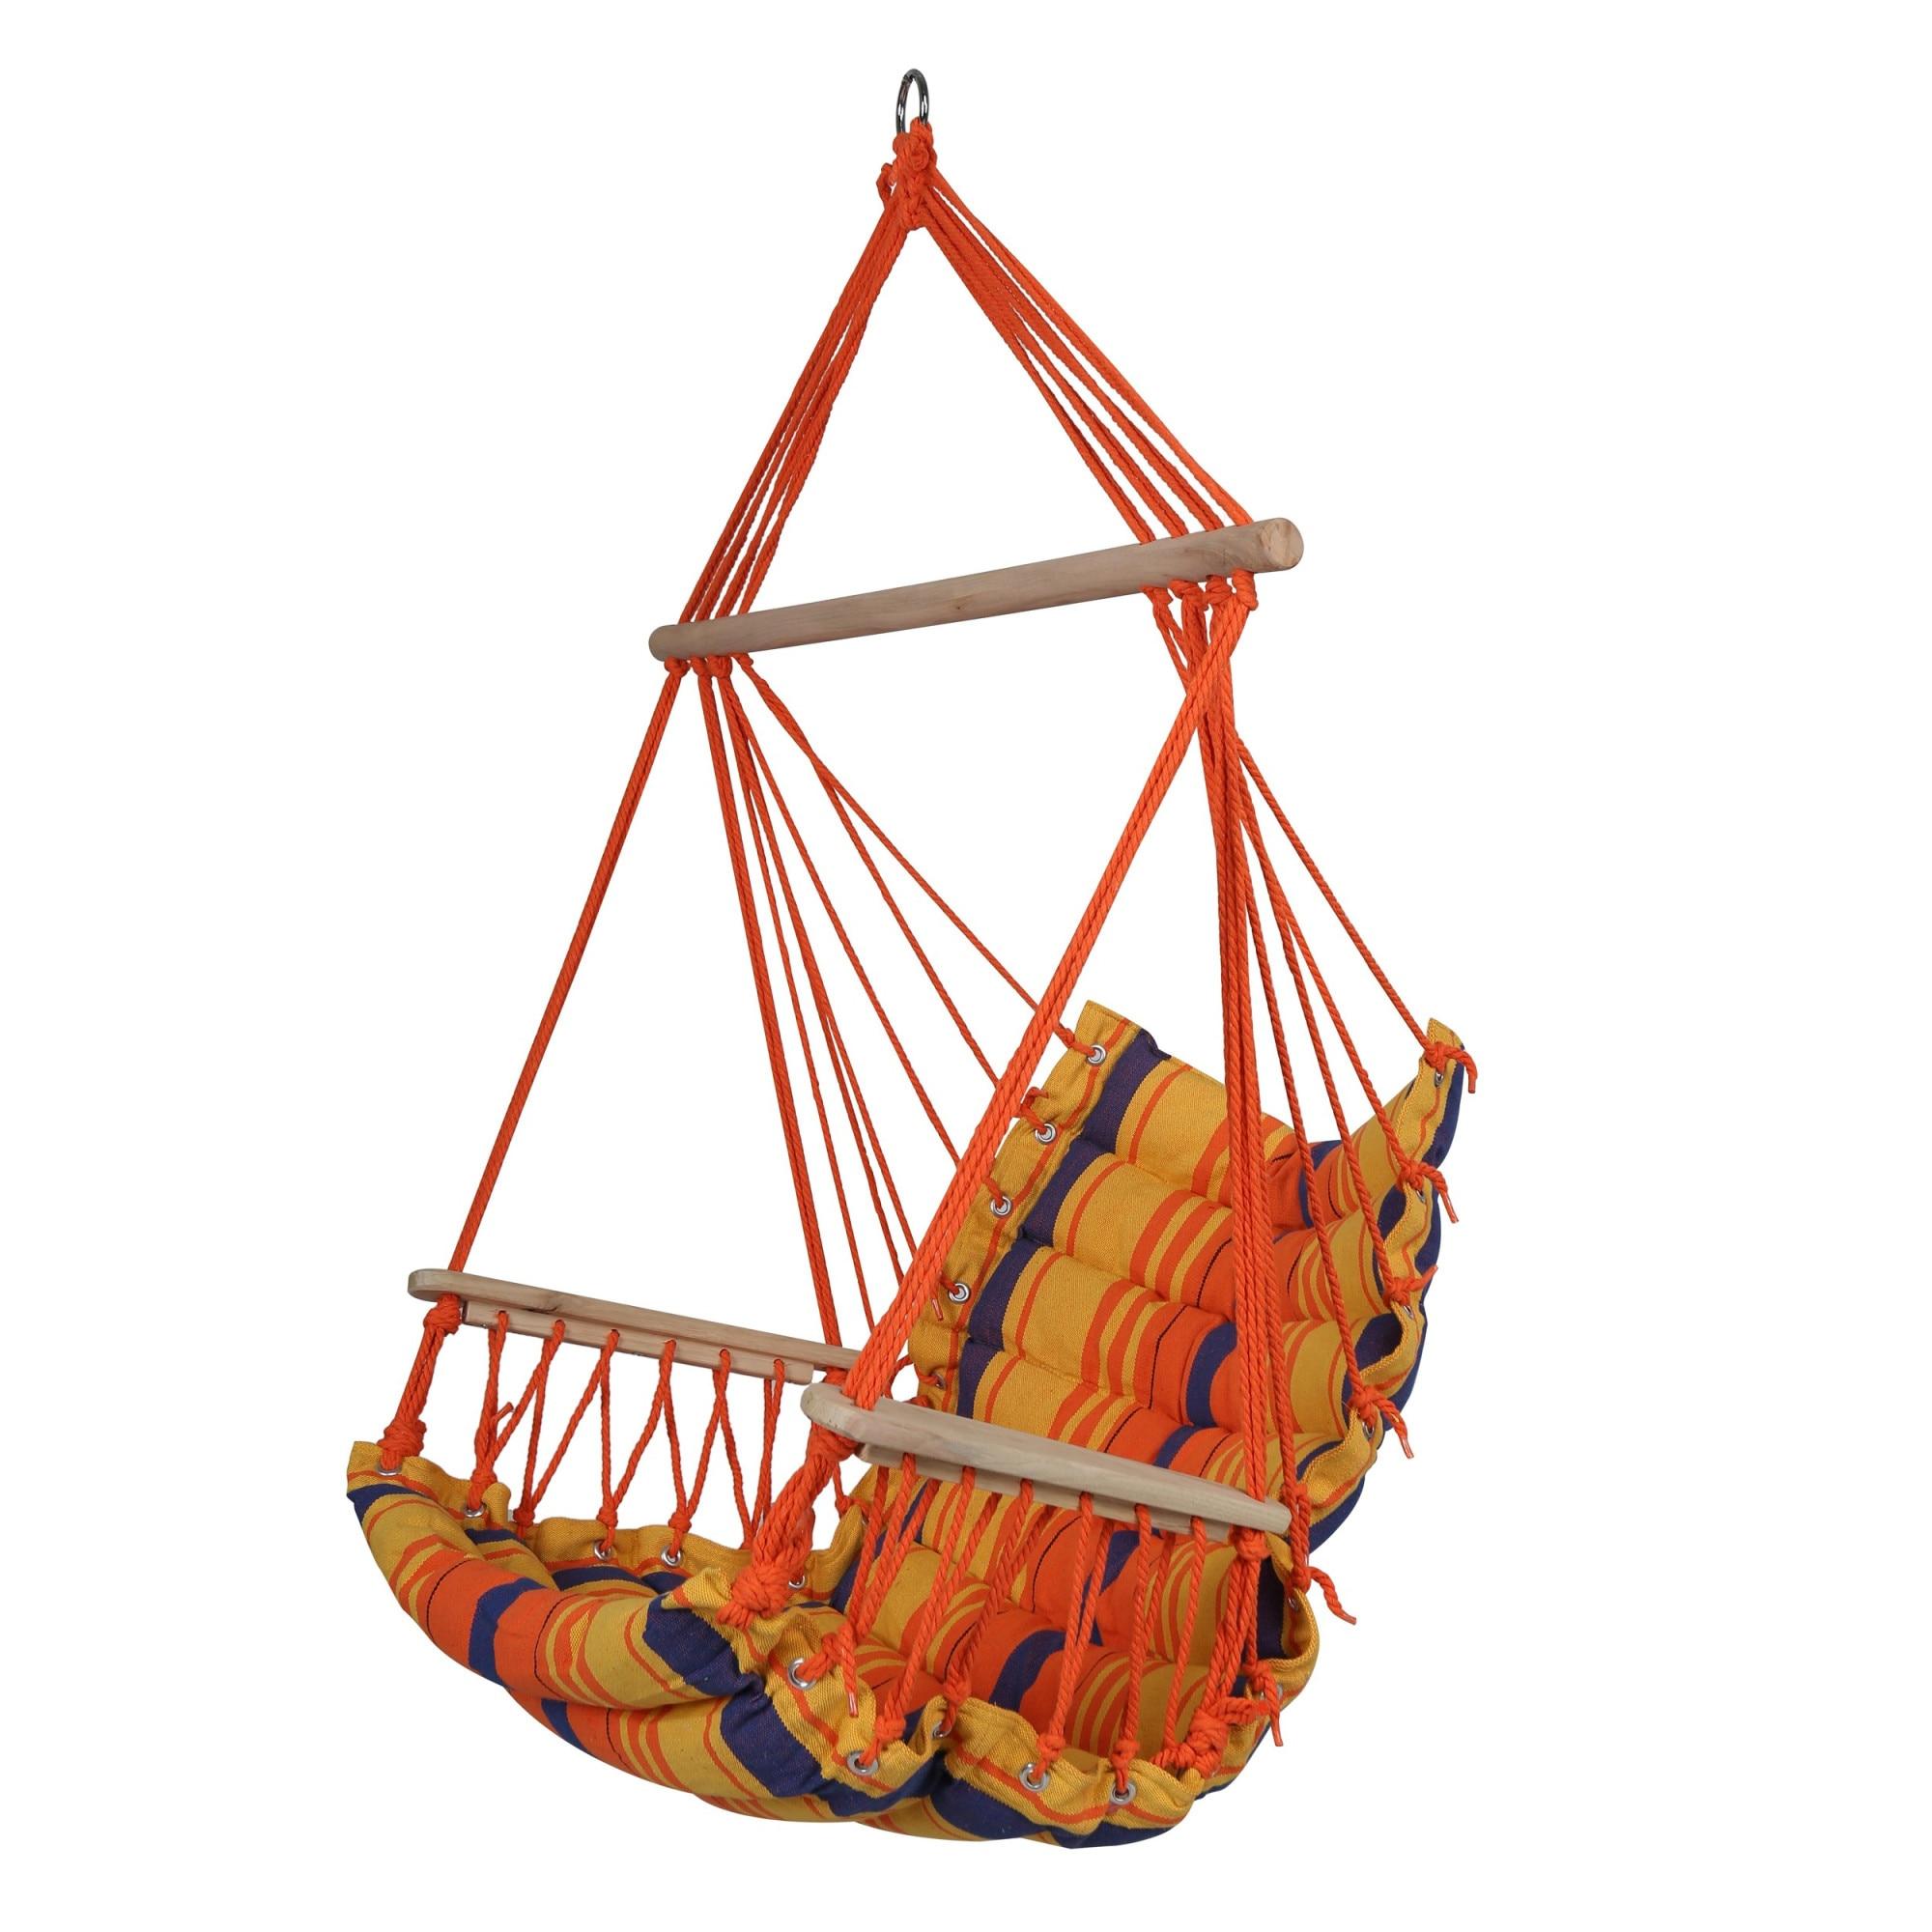 Hamac Art Tip Scaun Confectionat Din Bumbac Si Poliester Cu Bara Din Lemn 90 X 65 Cm Emag Ro